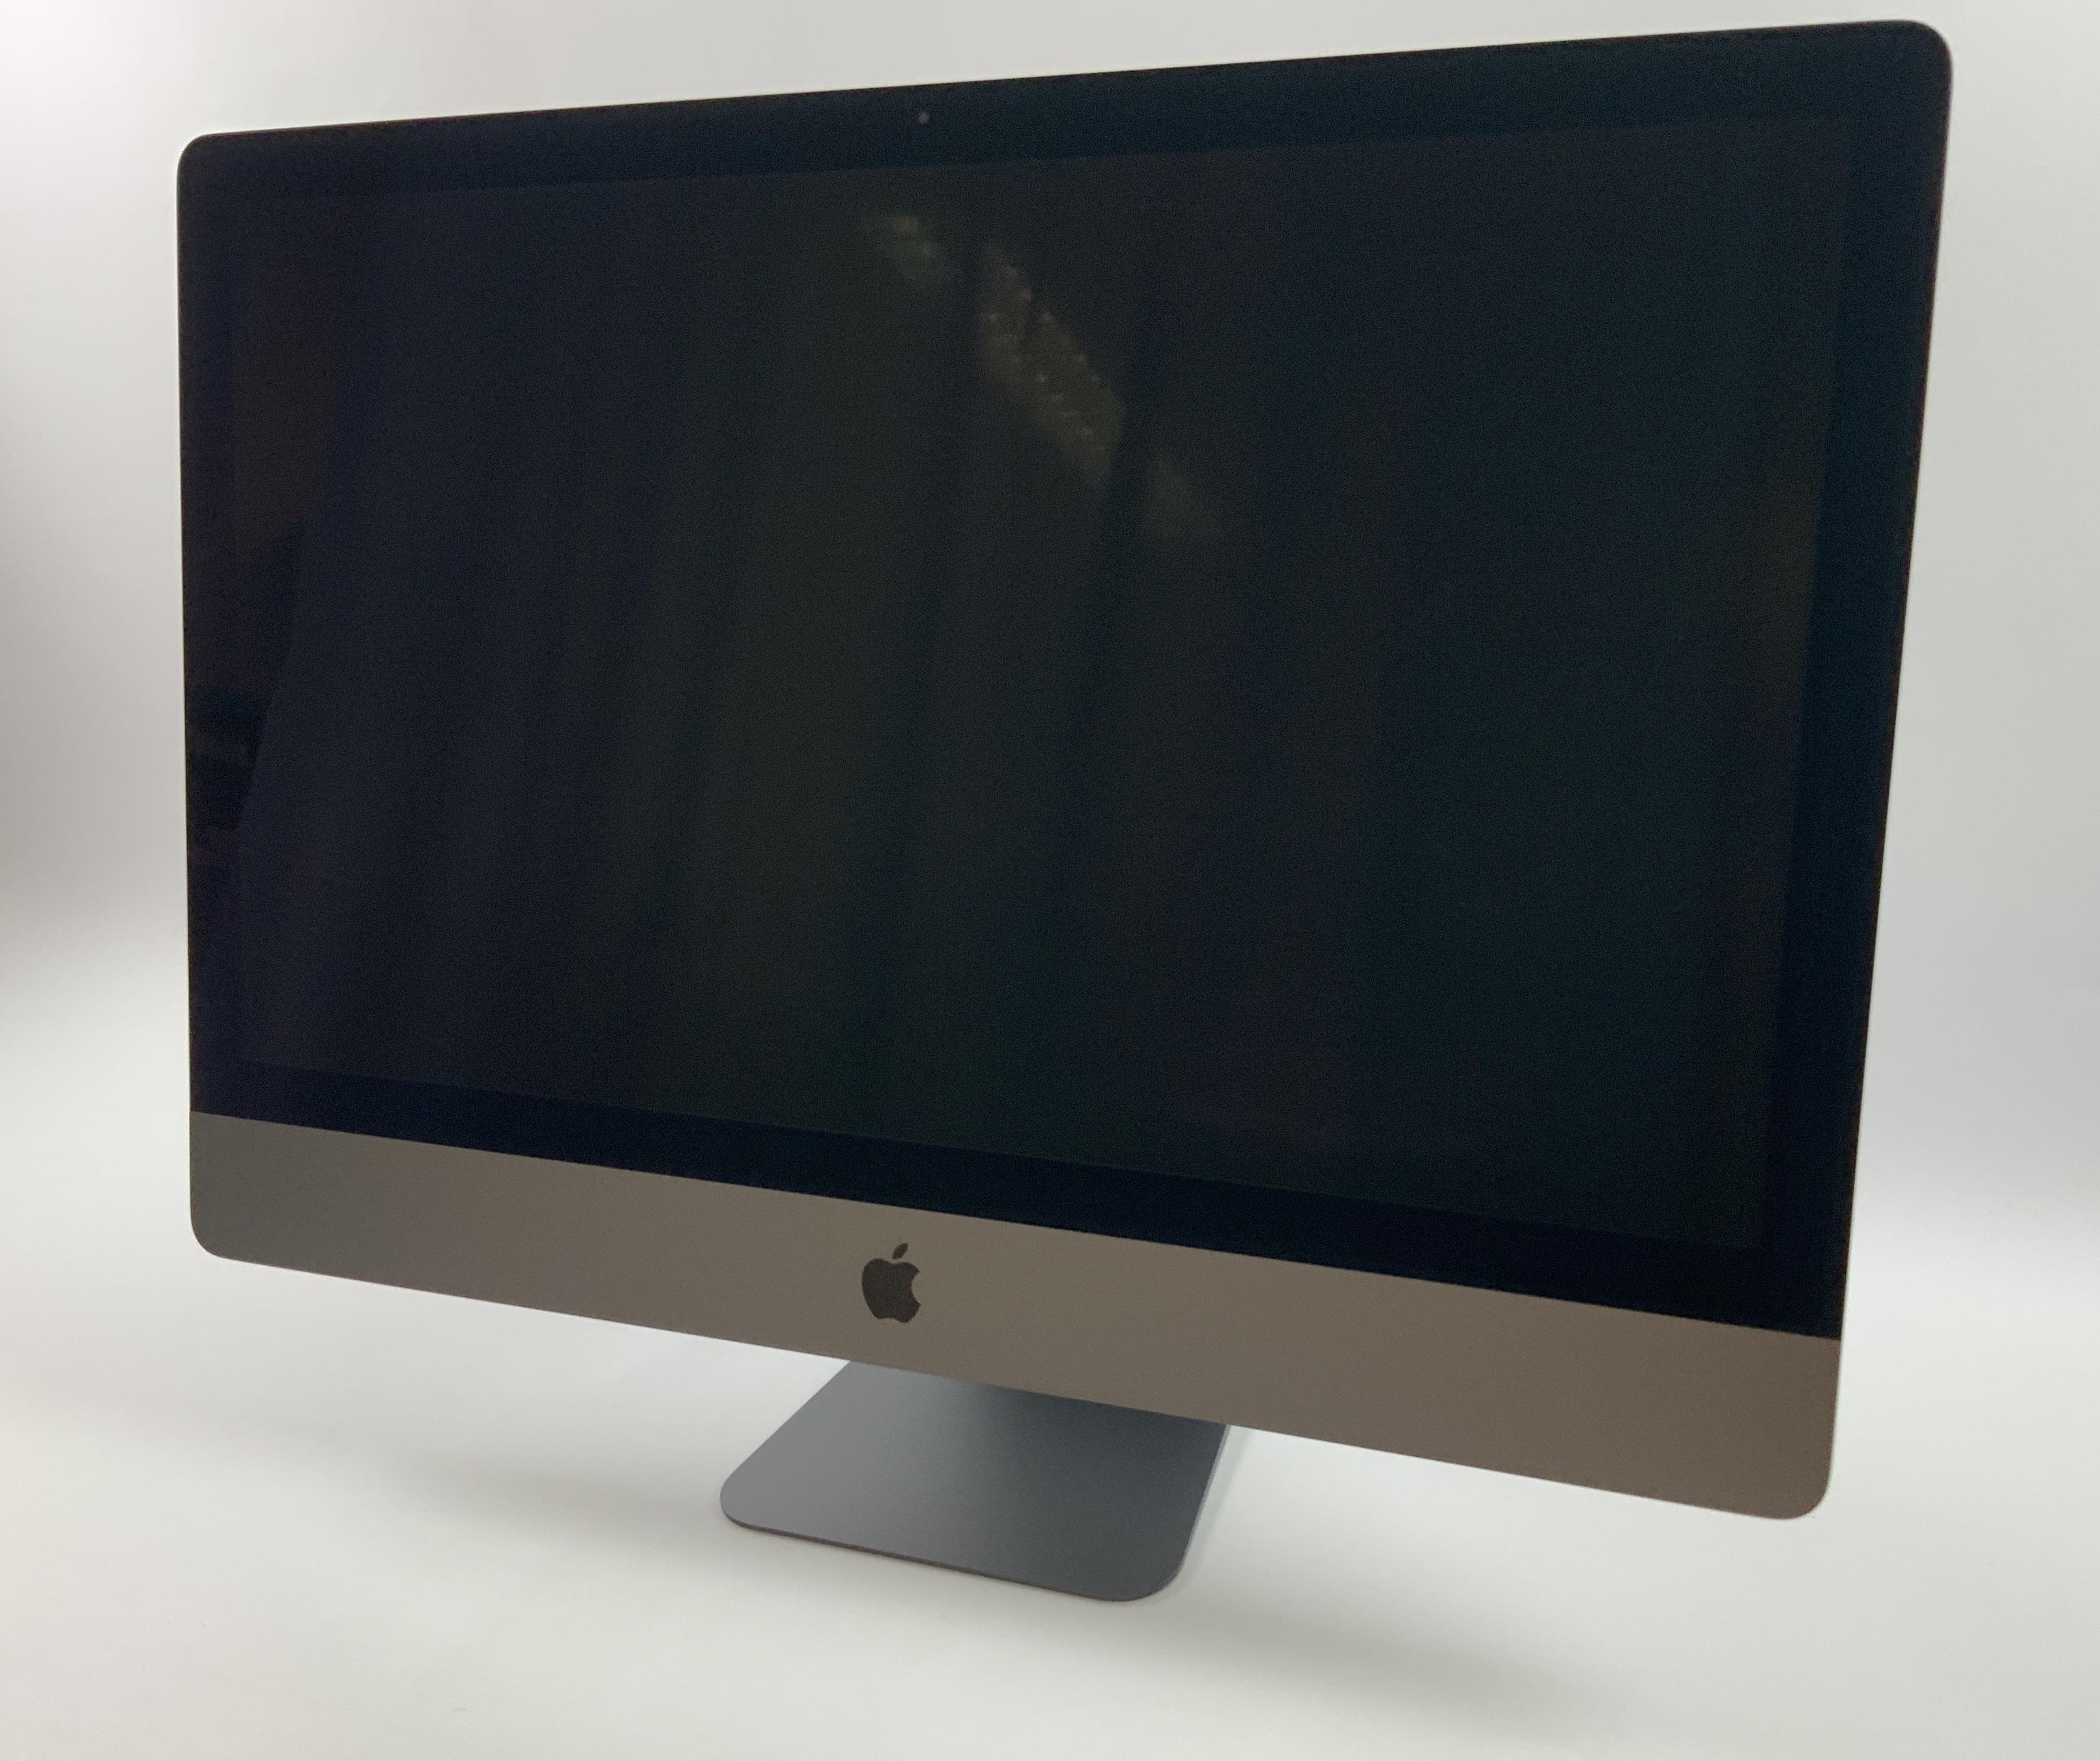 iMac Pro 2017 (Intel 8-Core Xeon W 3.2 GHz 32 GB RAM 1 TB SSD), Intel 8-Core Xeon W 3.2 GHz, 32 GB RAM, 1 TB SSD, immagine 1